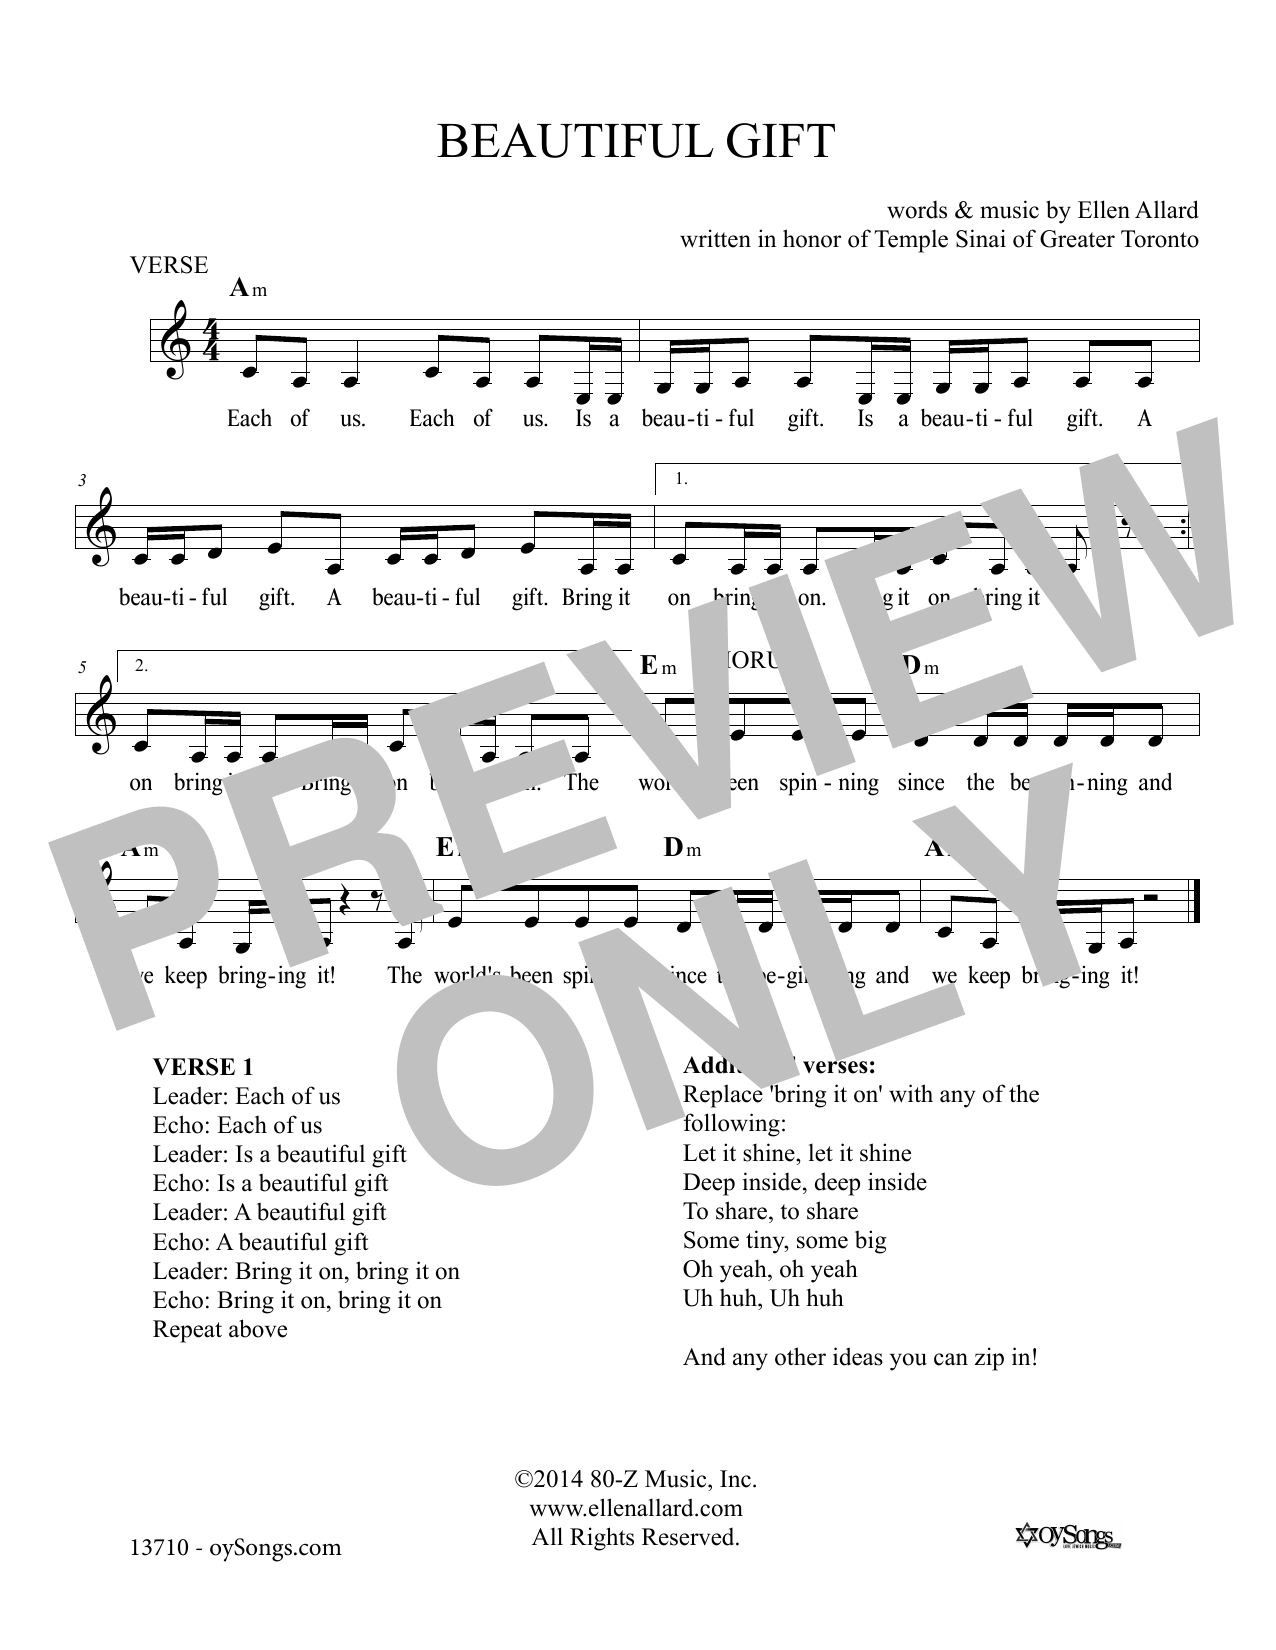 Ellen Allard Beautiful Gift sheet music notes and chords. Download Printable PDF.